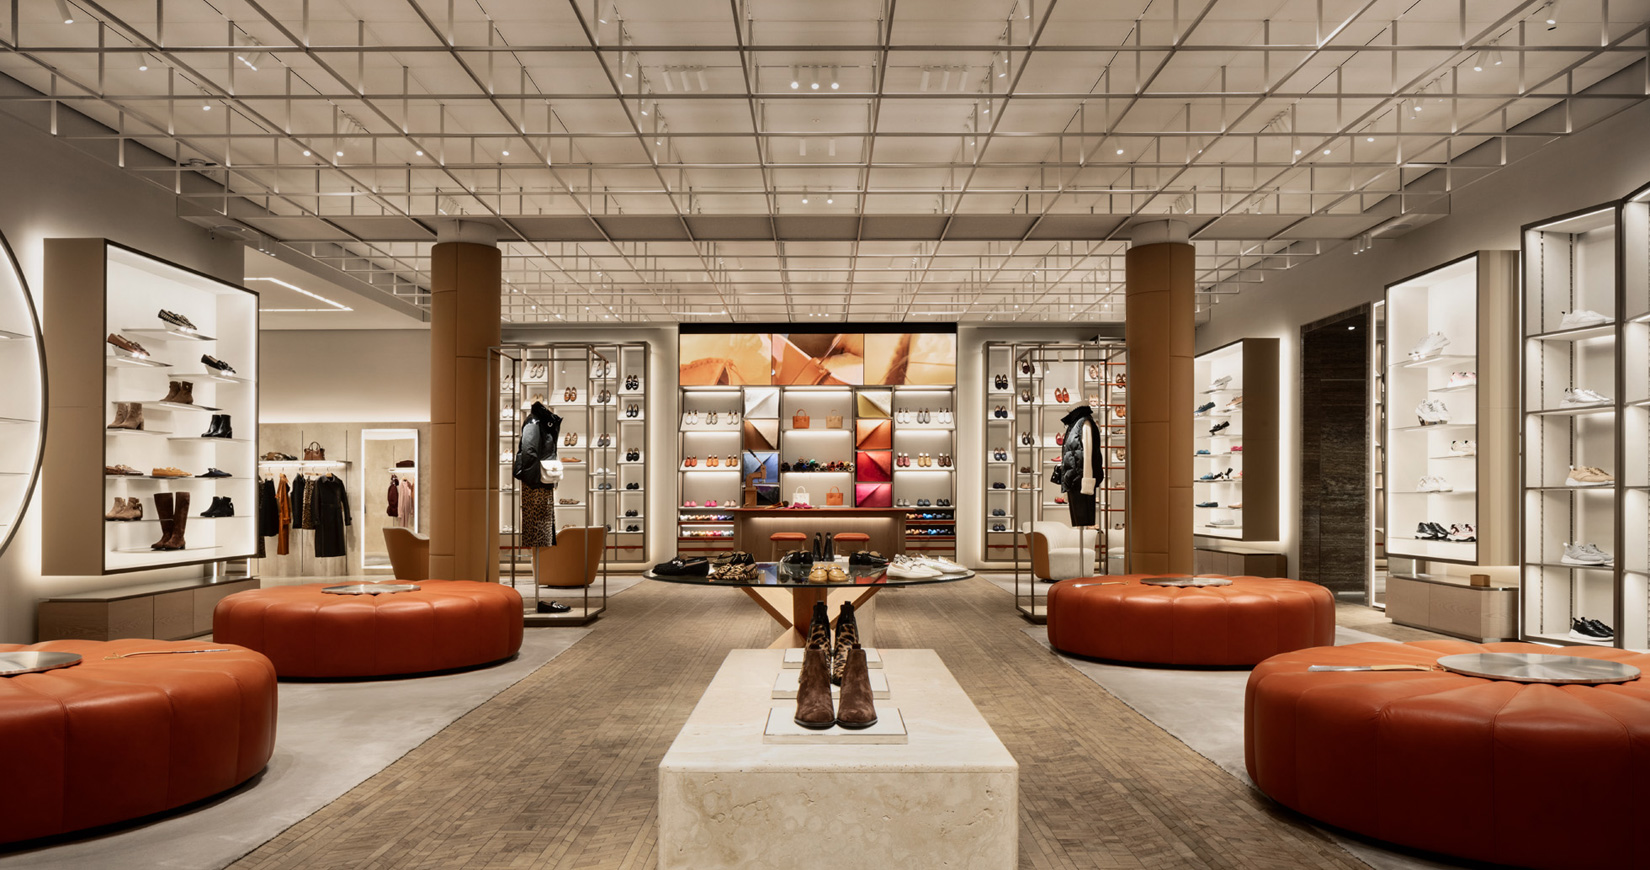 Tod's Studio flagship store concept in Milan, via Montenapoleone